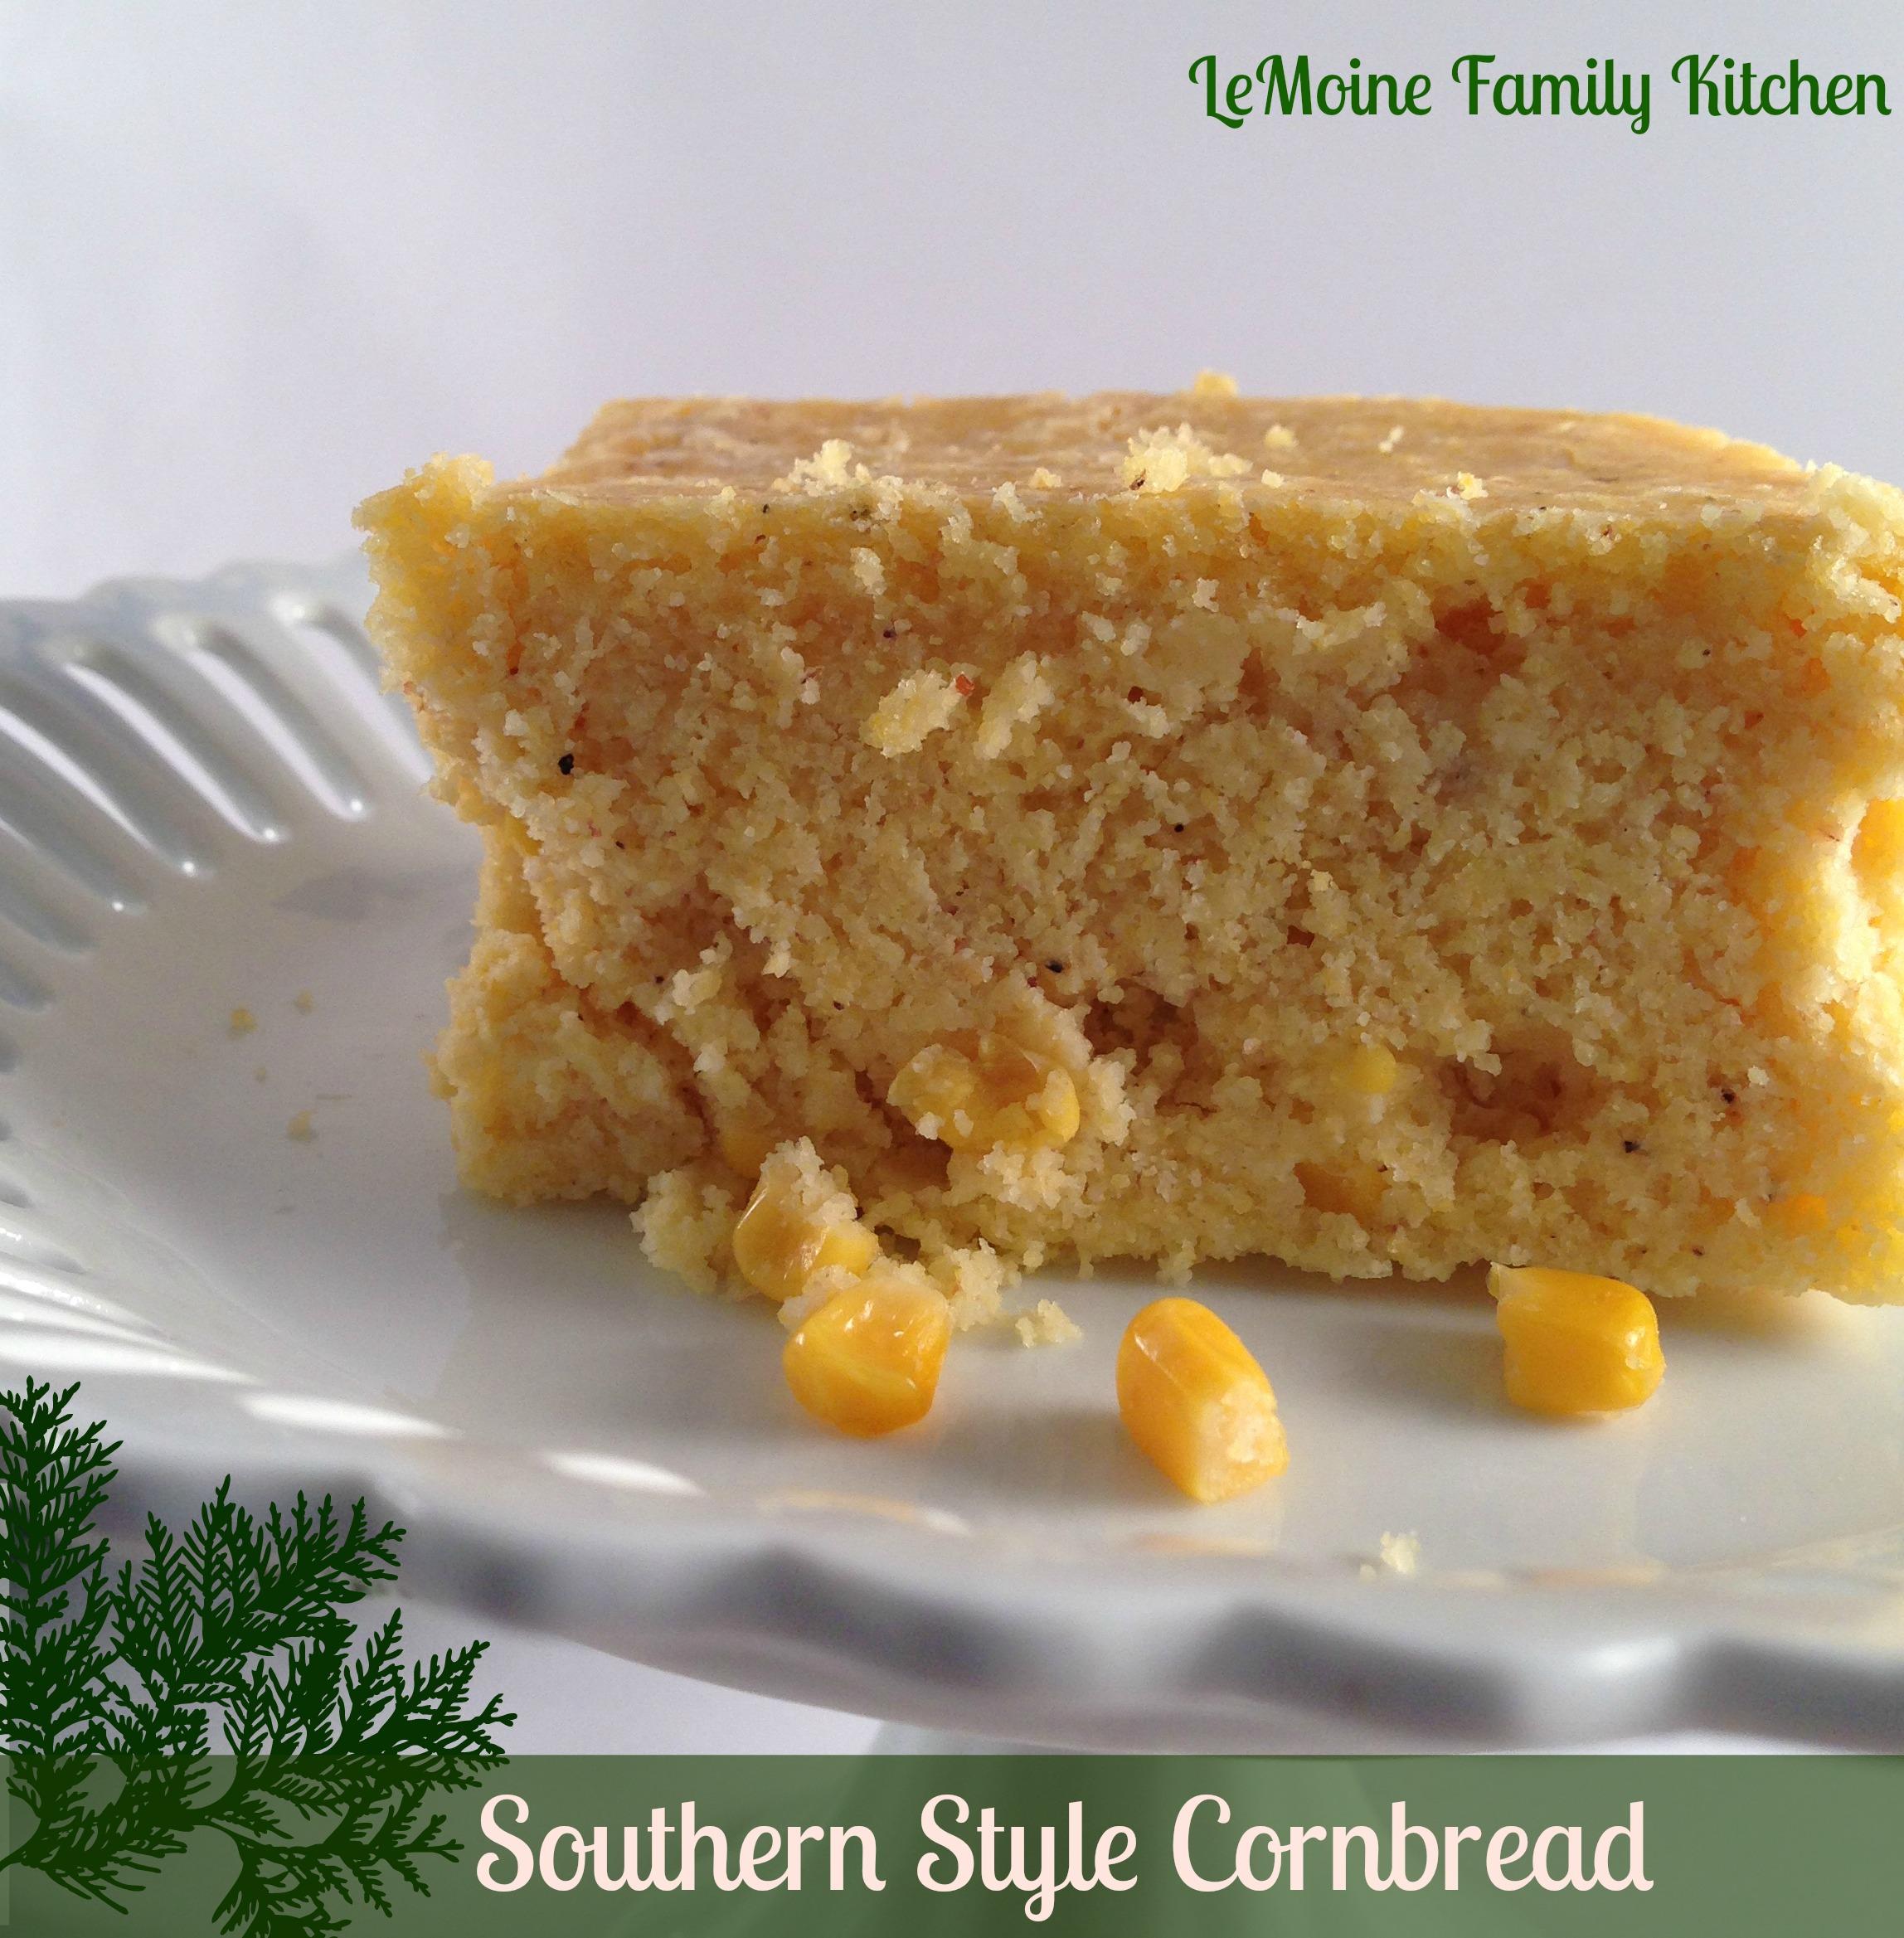 Southern Style Cornbread